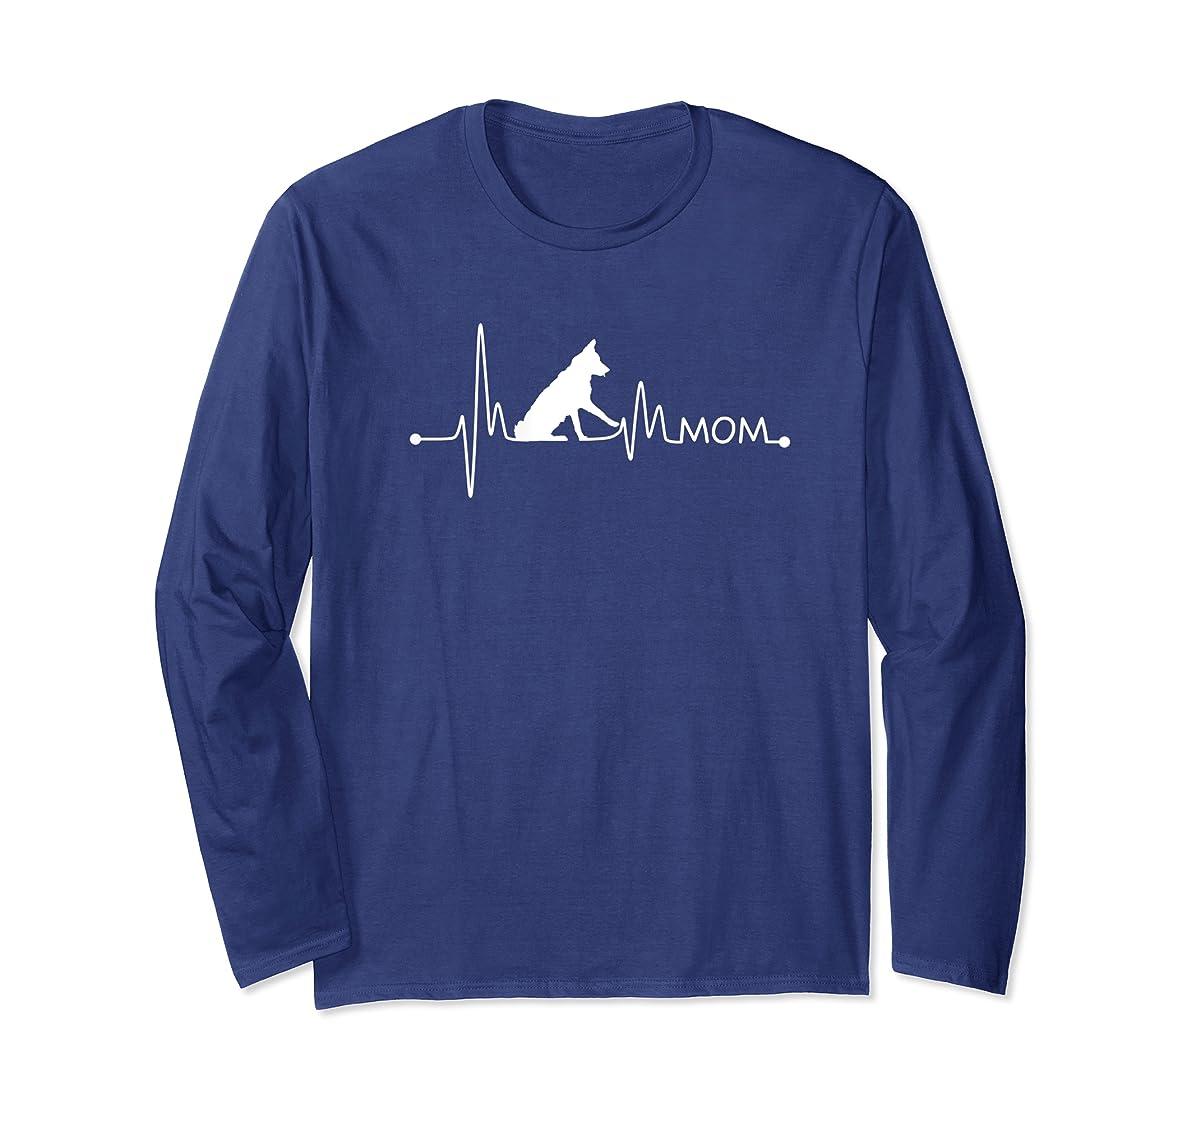 Womens Border Collie Heartbeat Mom Shirt Ekg Pulse Collie Lover Tee-Long Sleeve-Navy